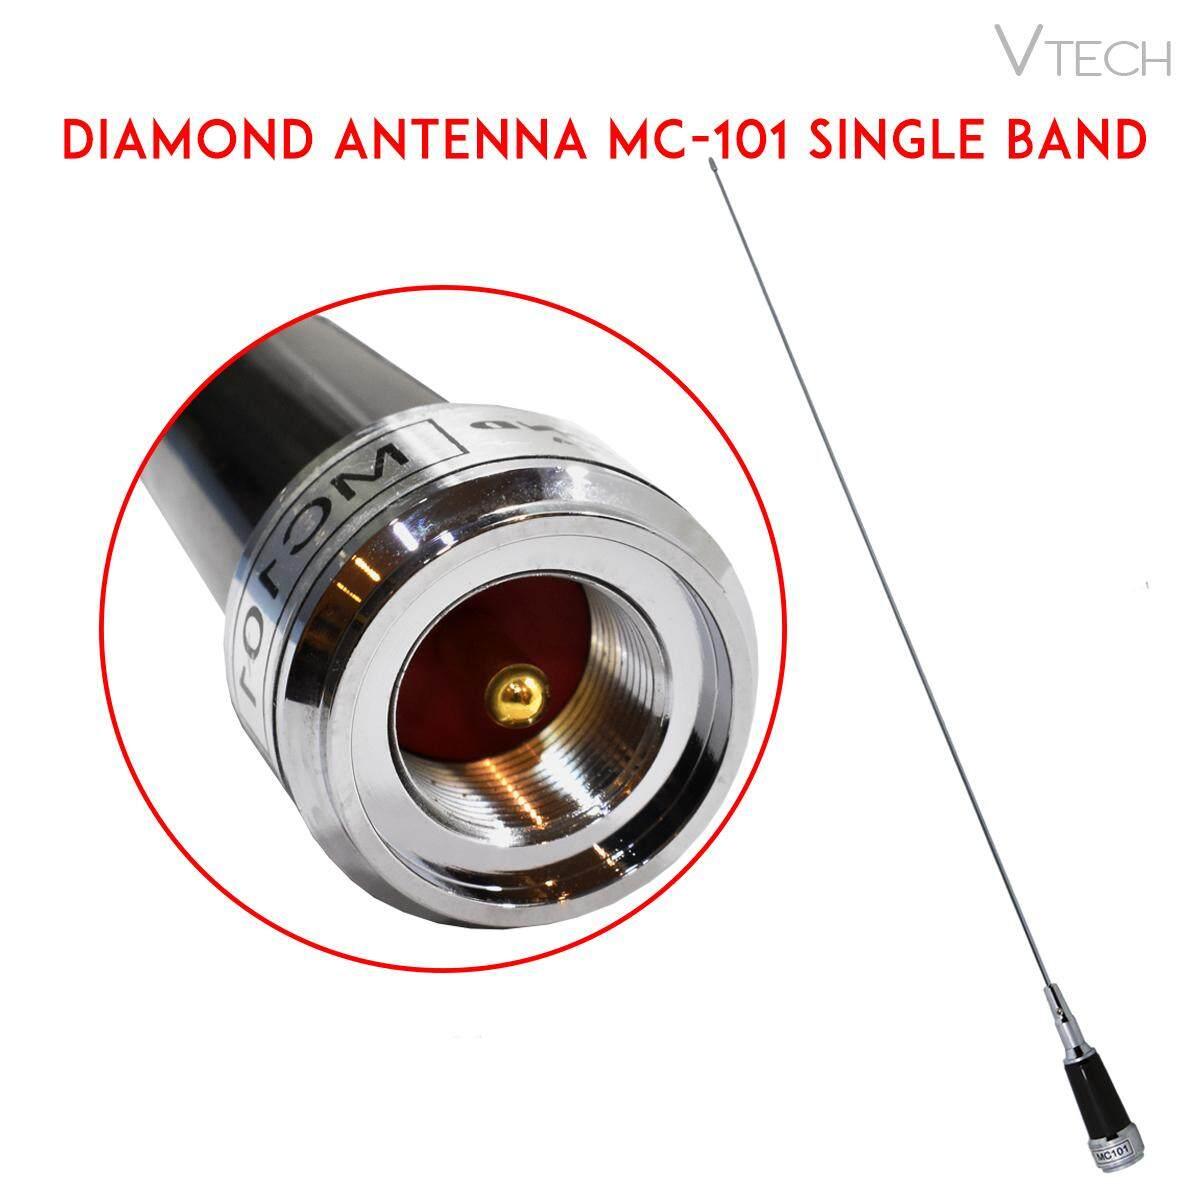 MC-101 DIAMOND HIGH PERFORMANCE 134-174MHZ VHF WHIP ANTENNA WALKIE TALKIE  (SILVER)